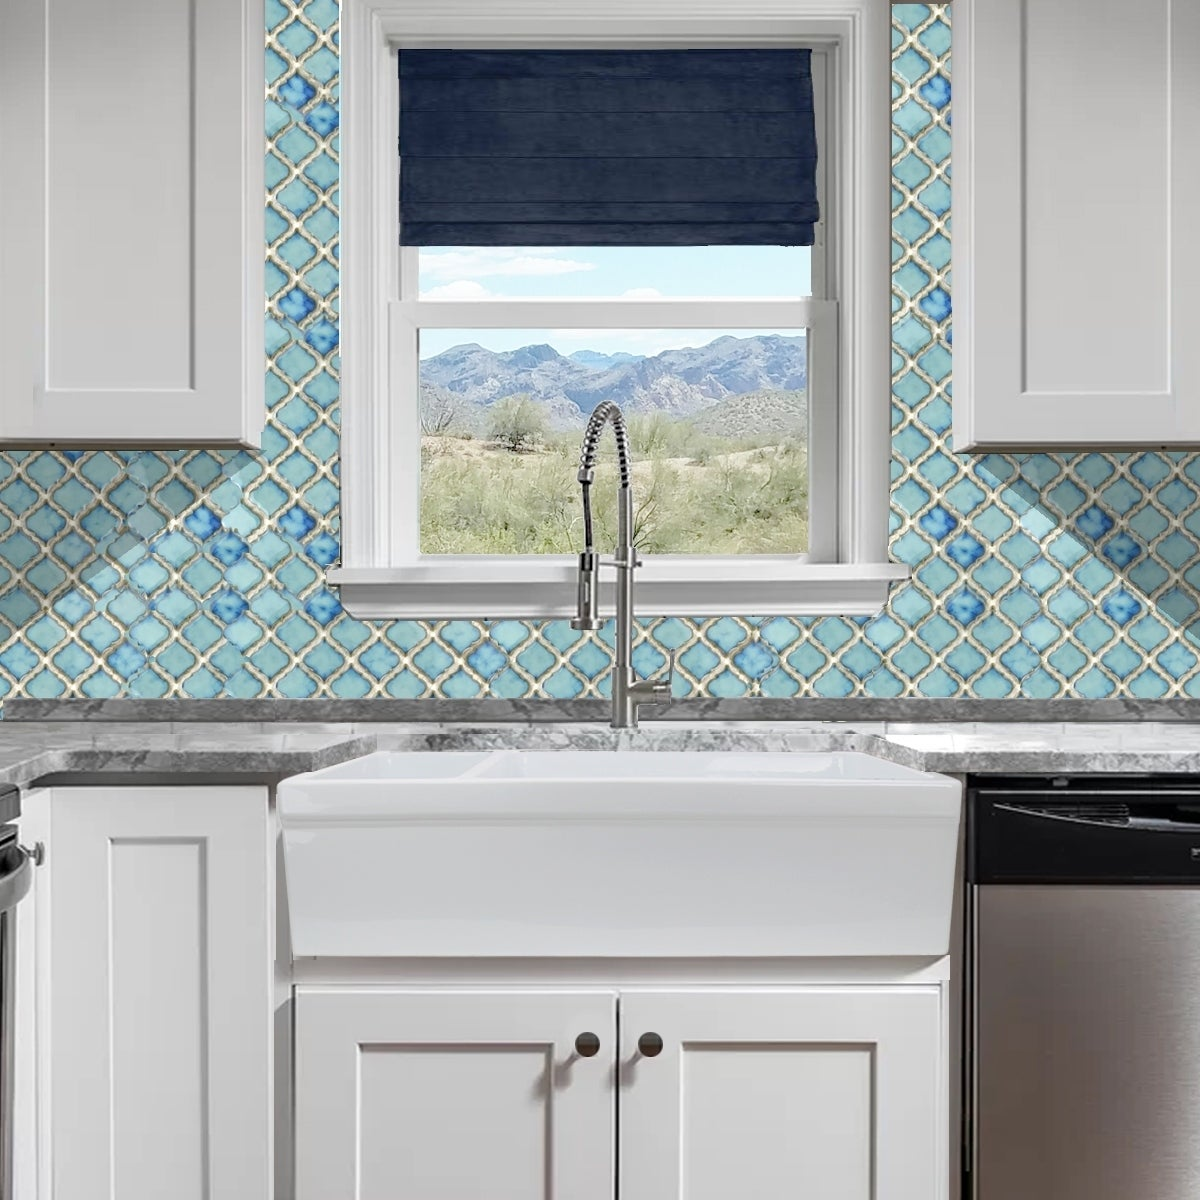 Fireclay Sinks | Shop our Best Home Improvement Deals Online at ...